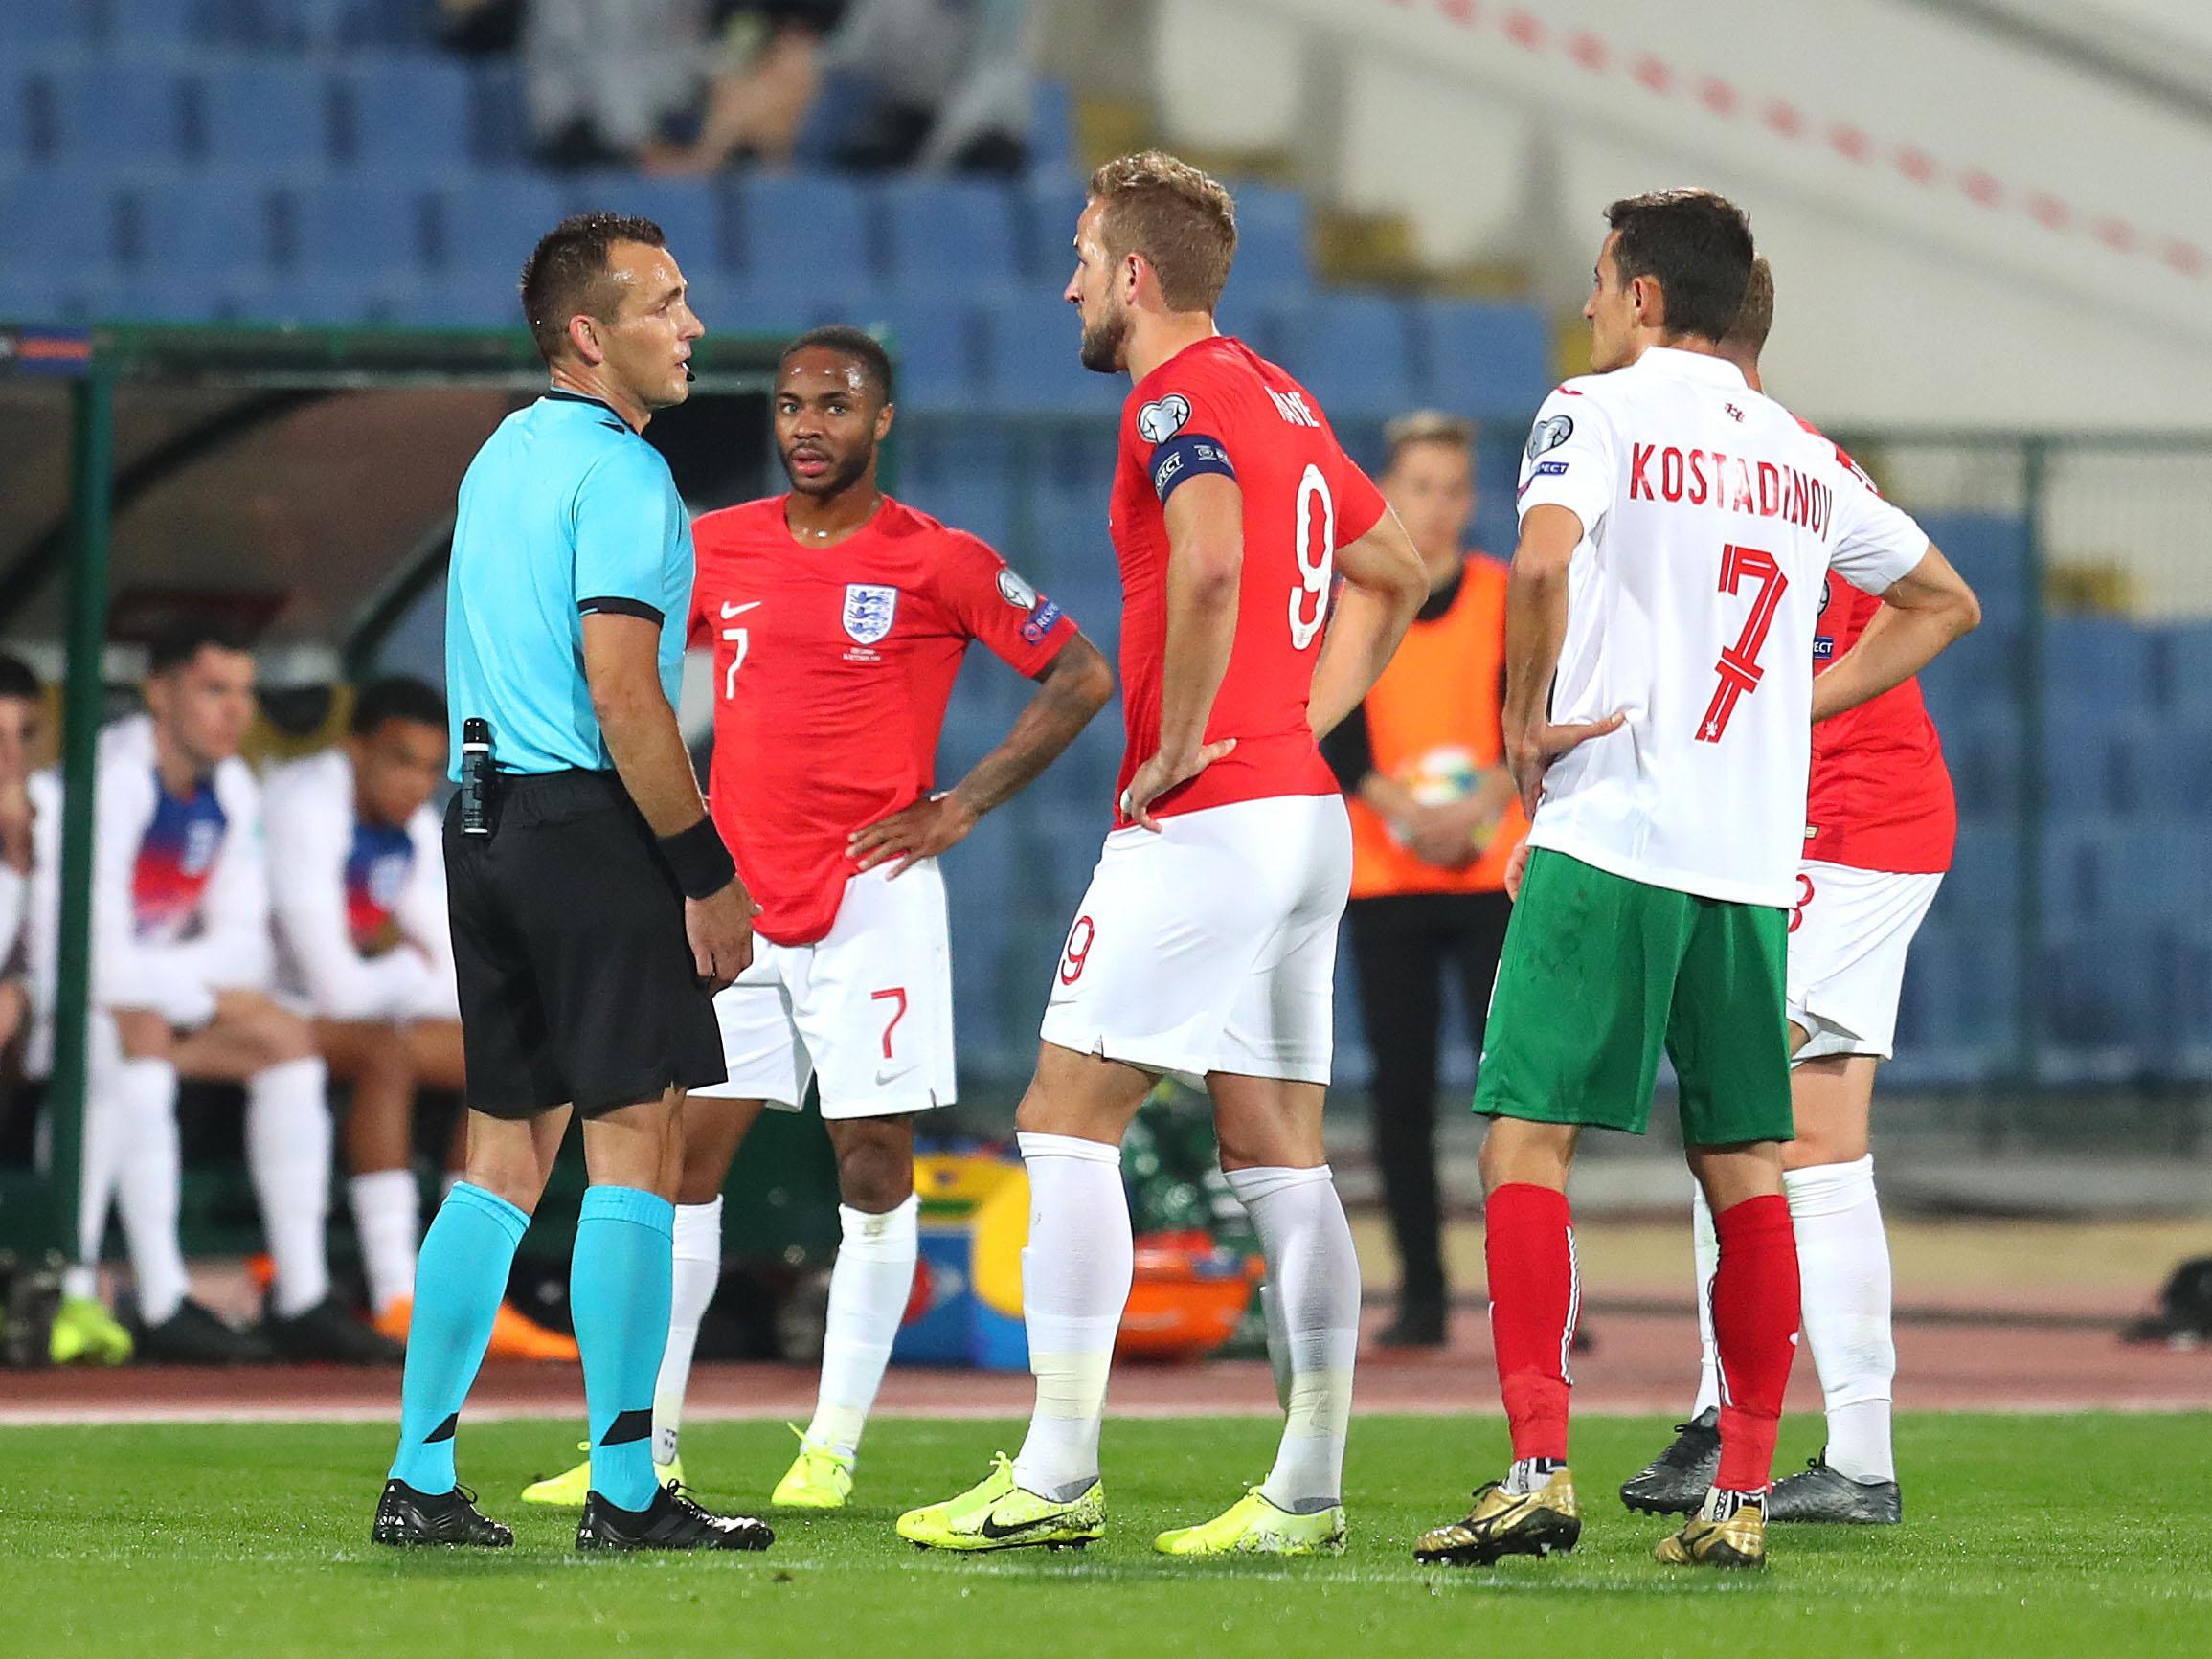 bulgaria vs england - photo #15